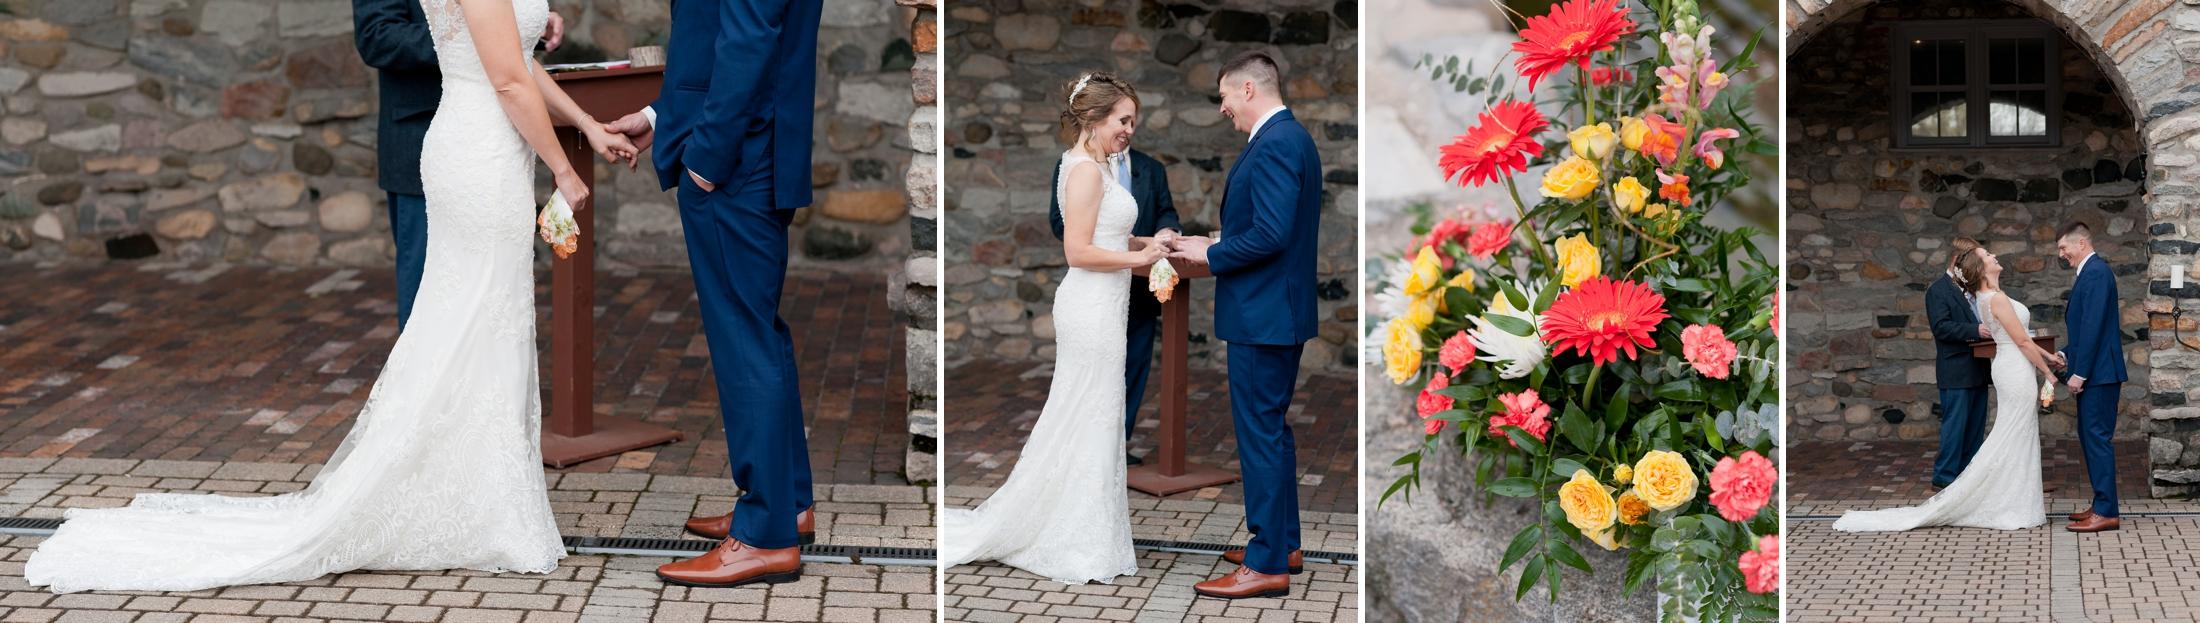 Wisconsin Wedding Photographer, Castle Farms, Michigan | KLEM Studios